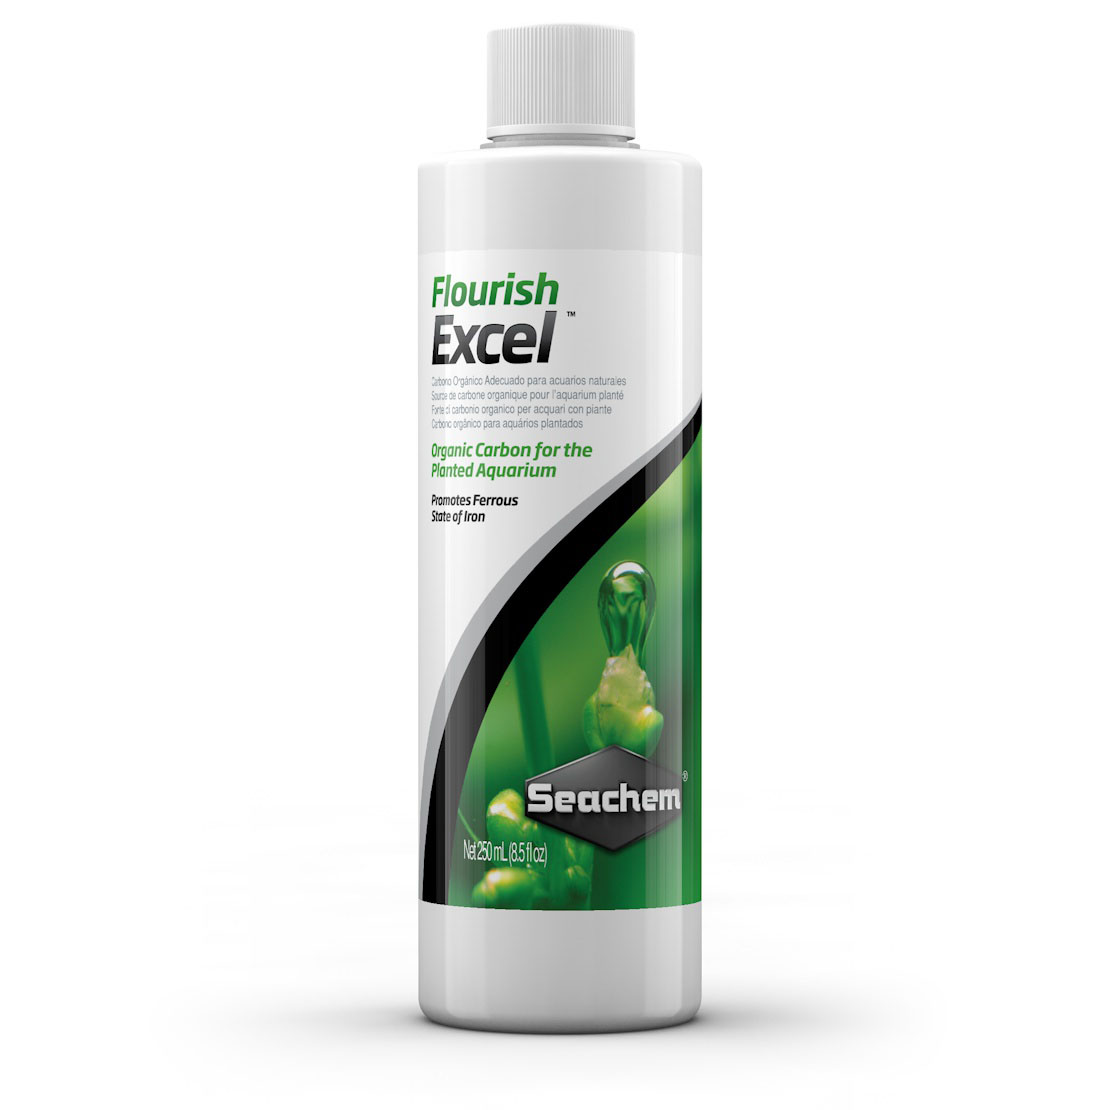 Seachem - Flourish Excel